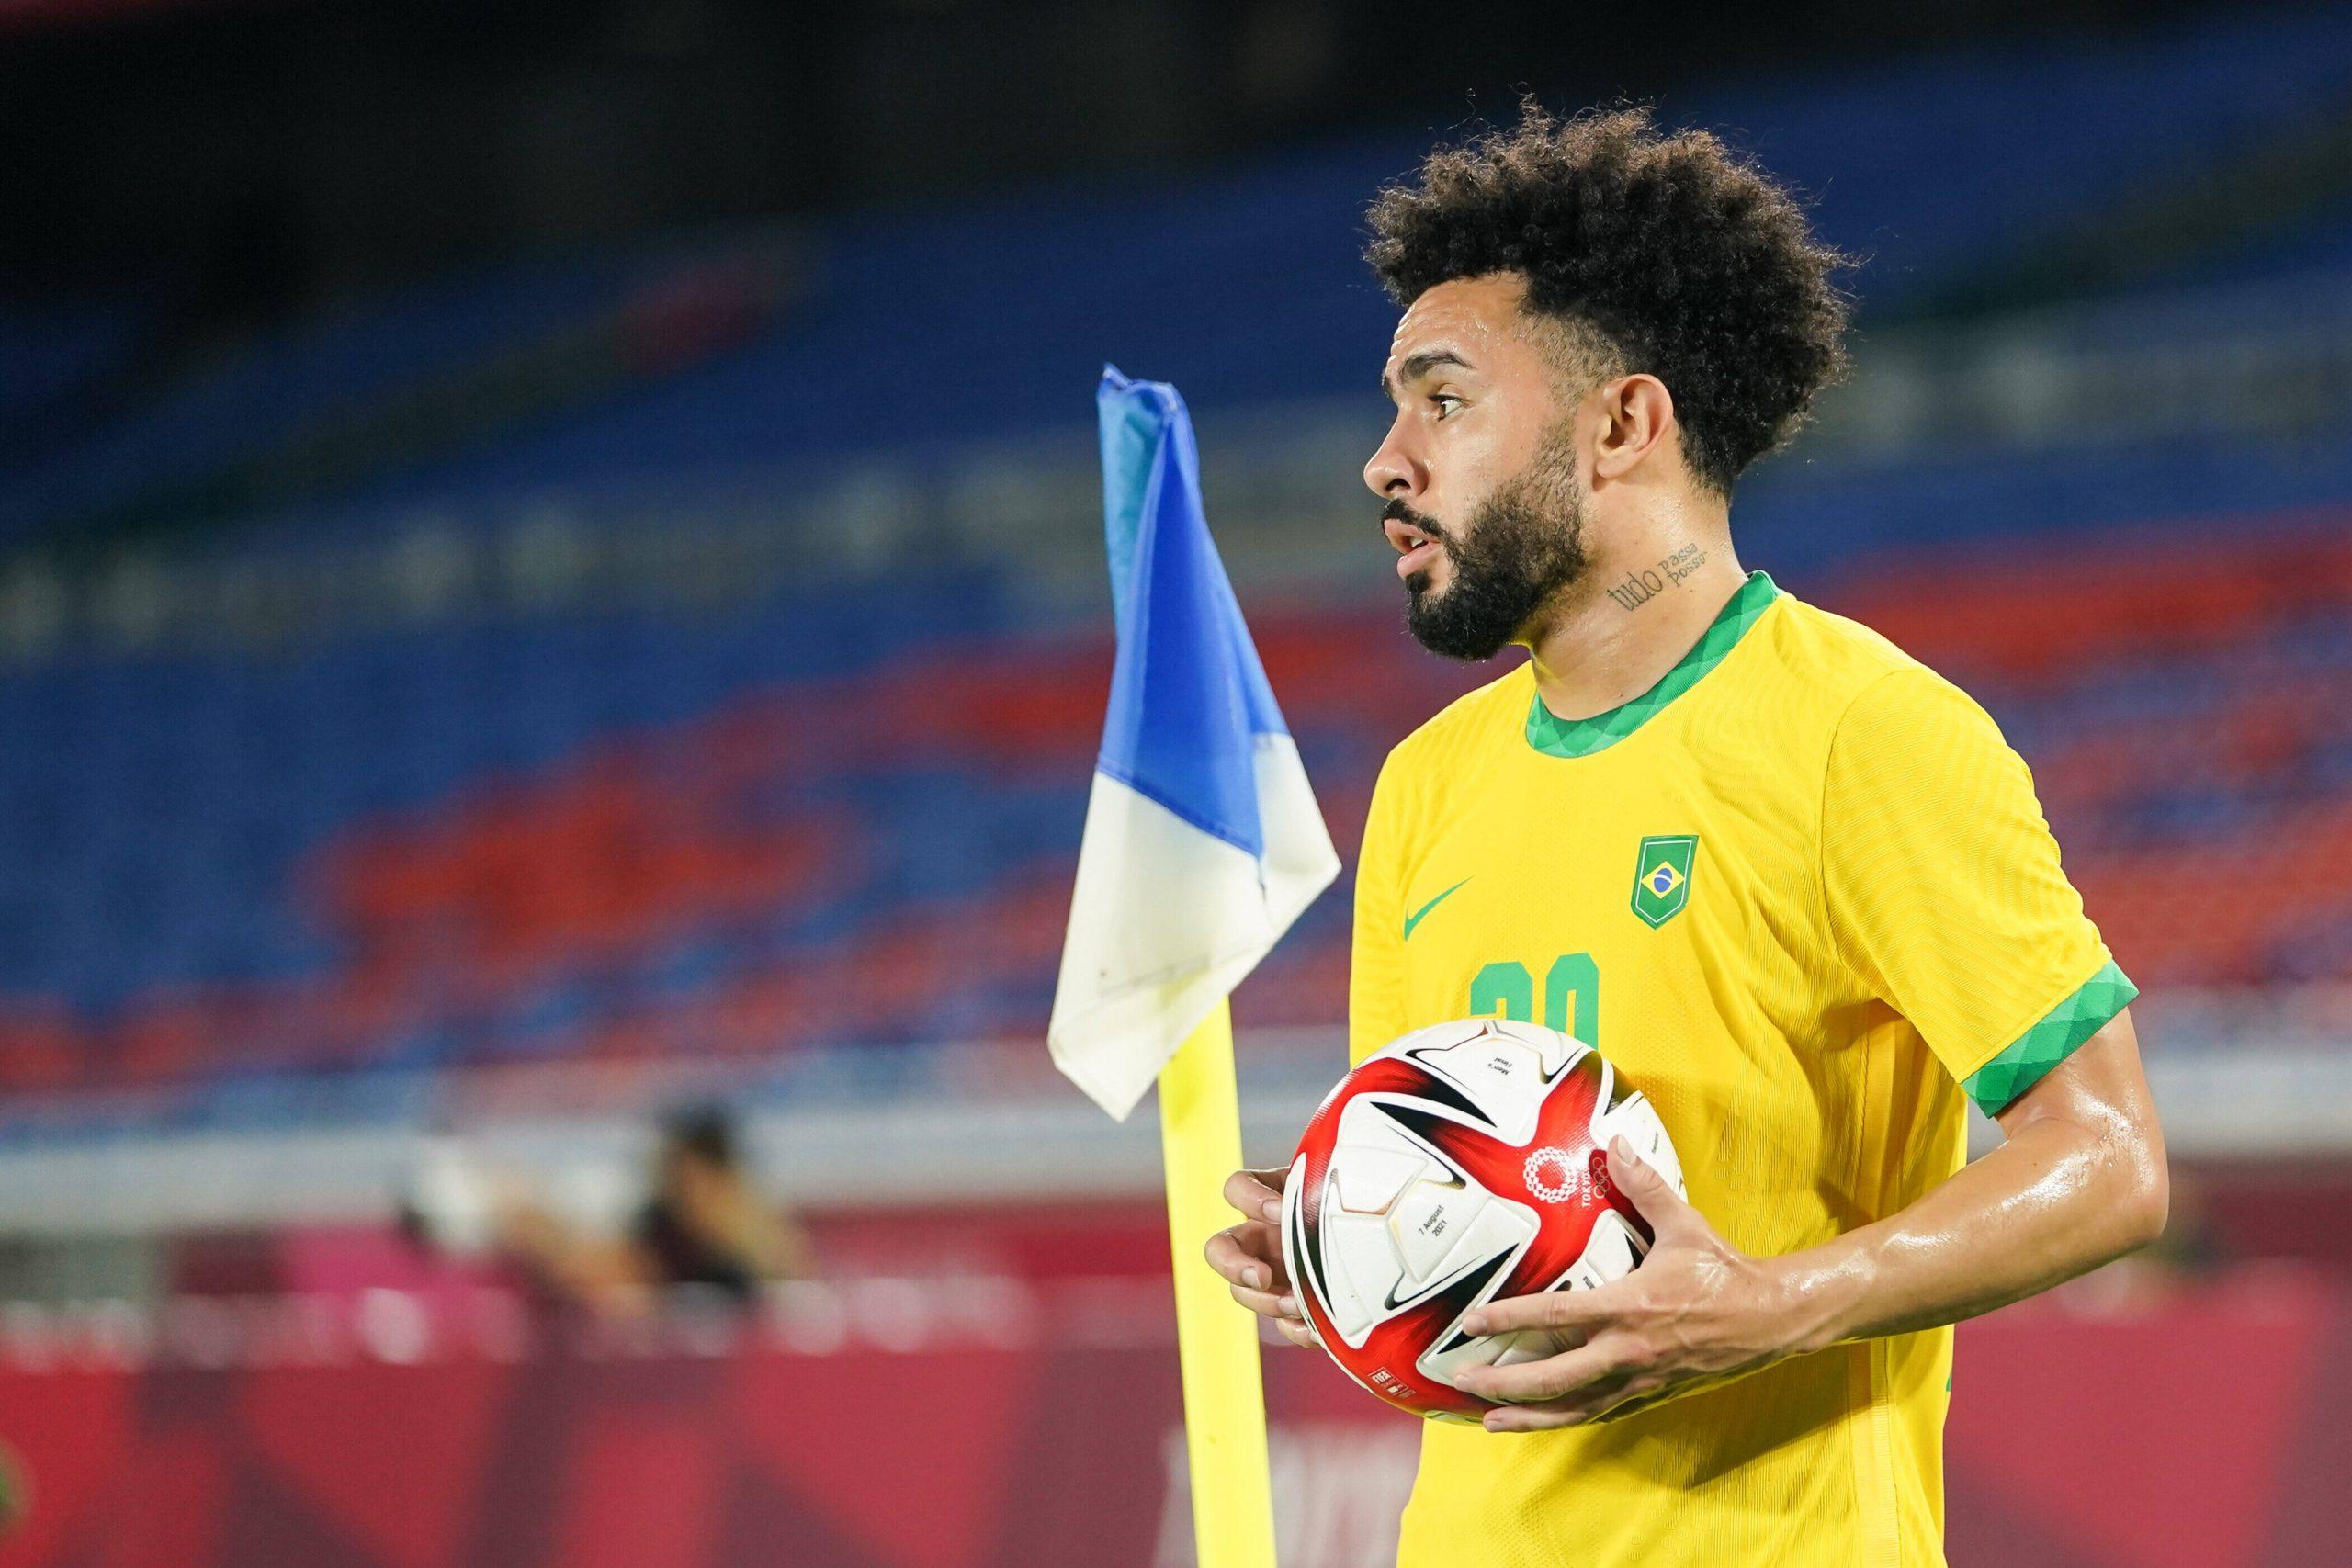 Claudinho transfer! – Zenit receive new wings!